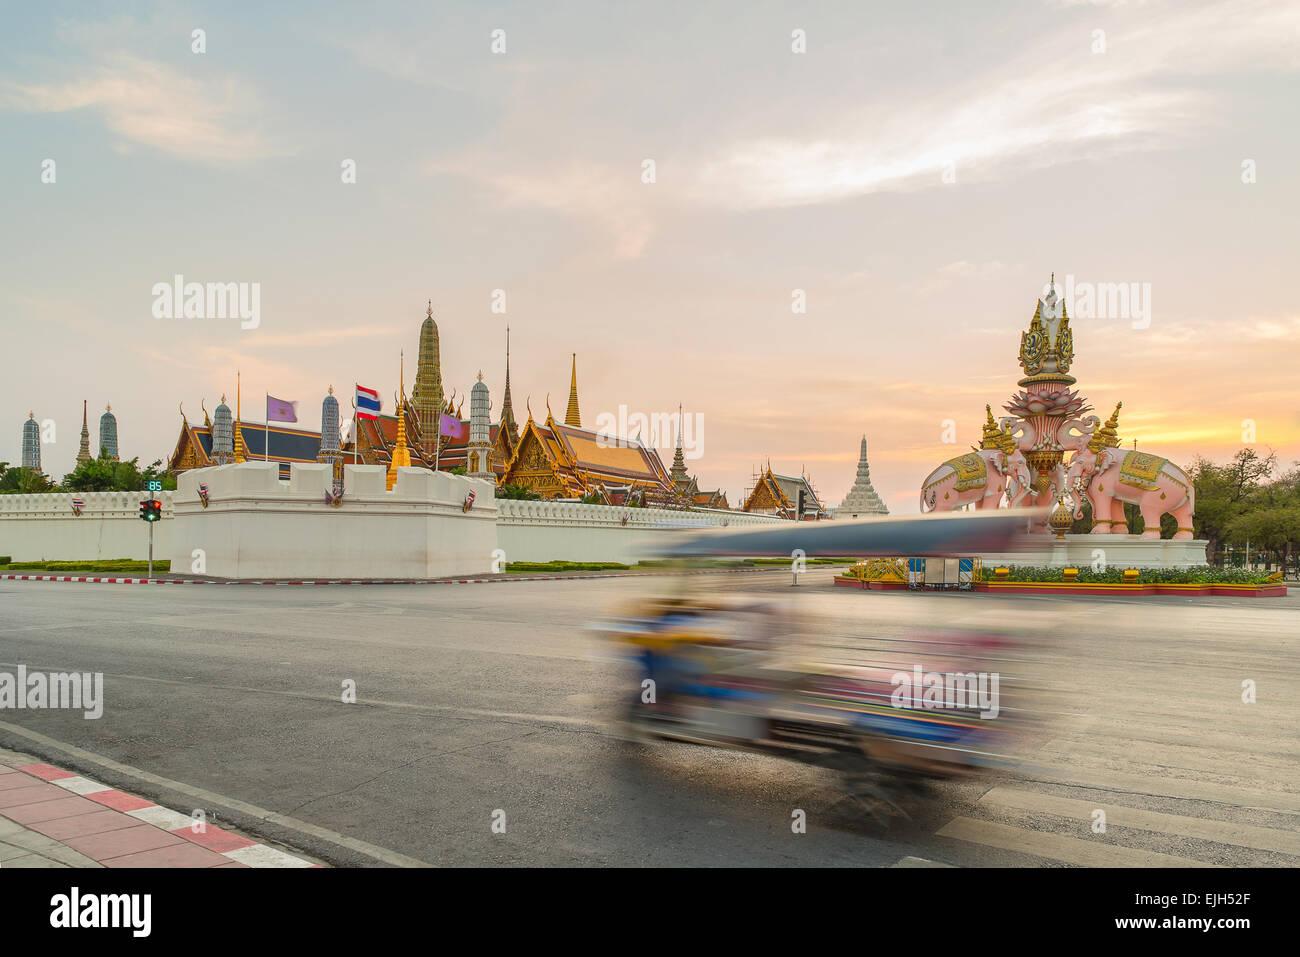 Tuk Tuk pour les voitures de tourisme. À visiter à Bangkok. Photo Stock